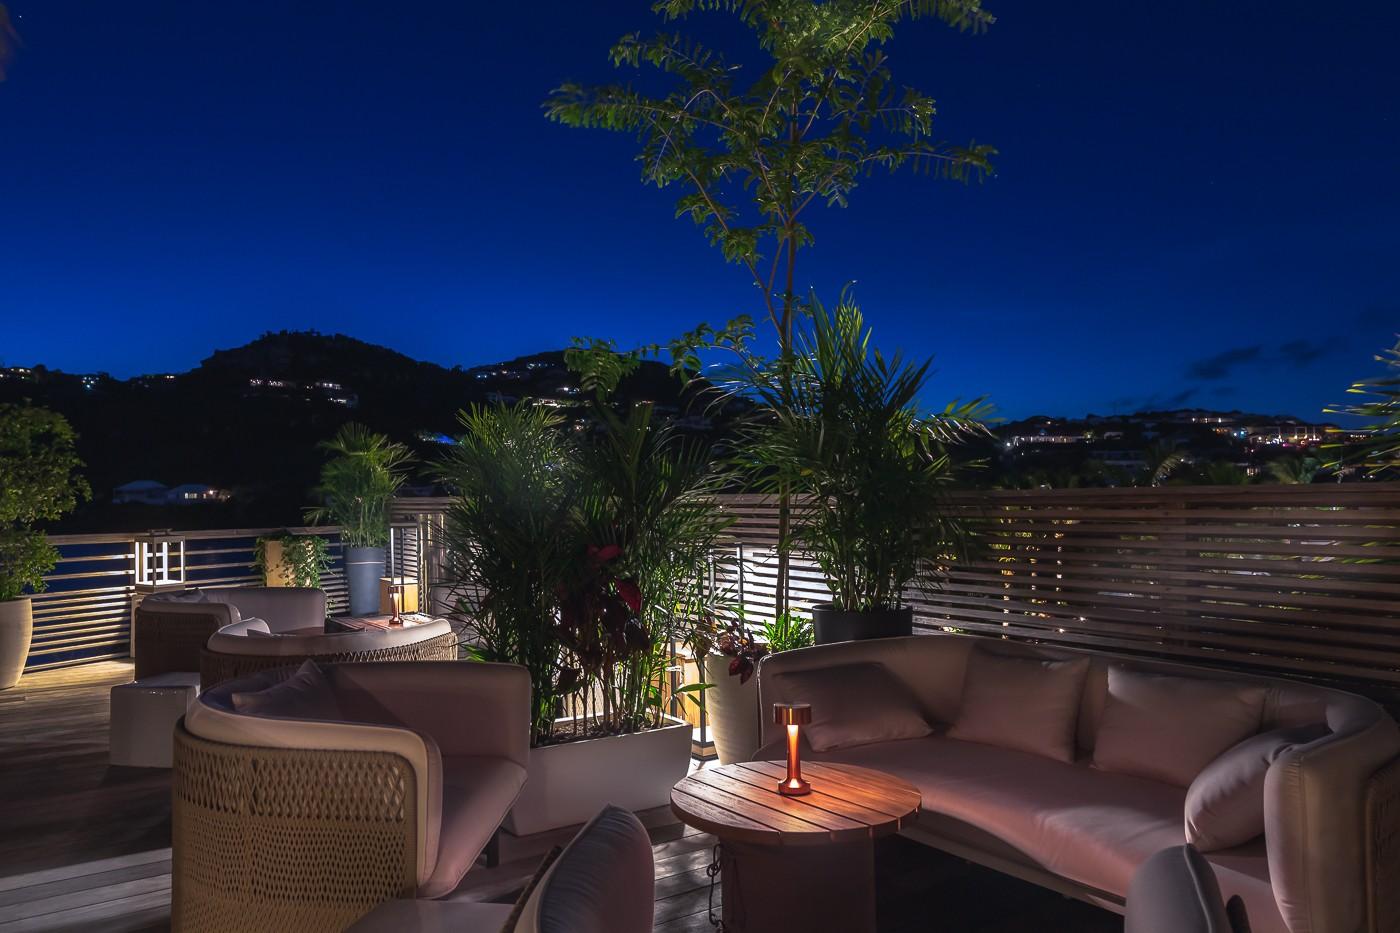 Le Barthélemy Hotel & Spa   Rooftop Bar @LaurentBenoit